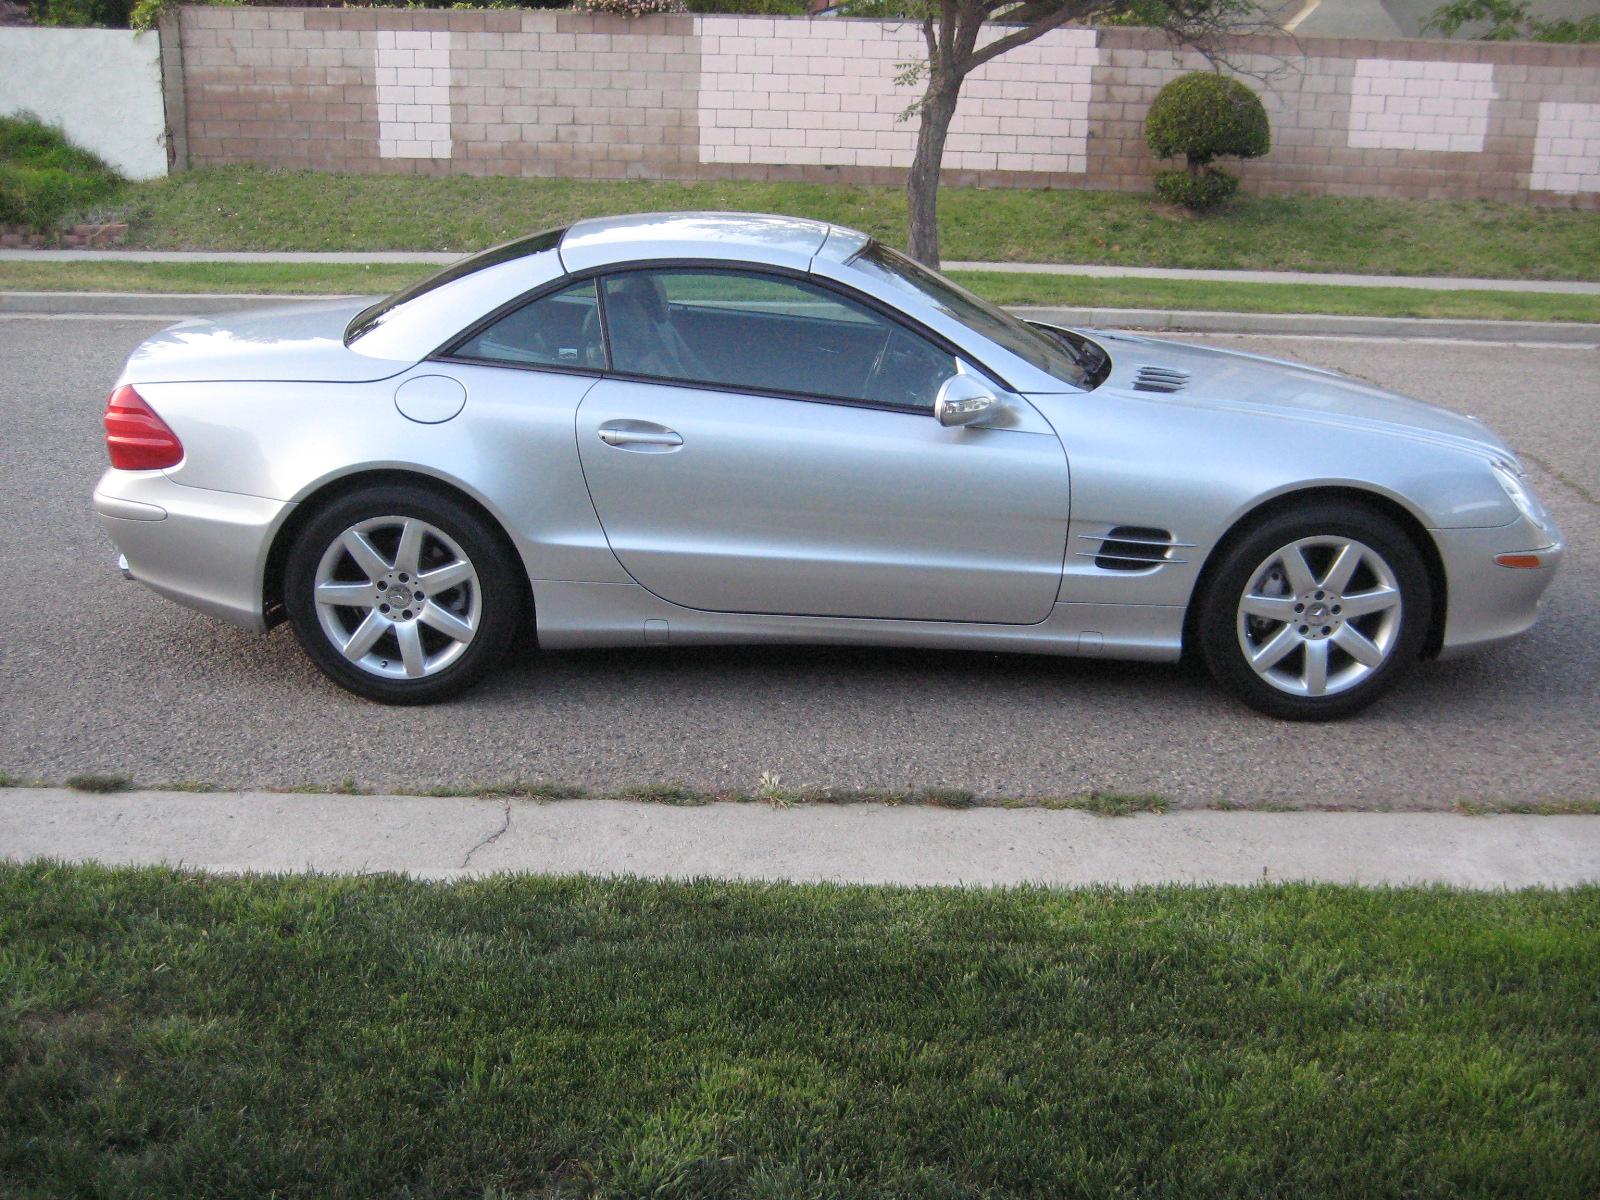 2003 Mercedes Benz Sl Class Pictures Cargurus